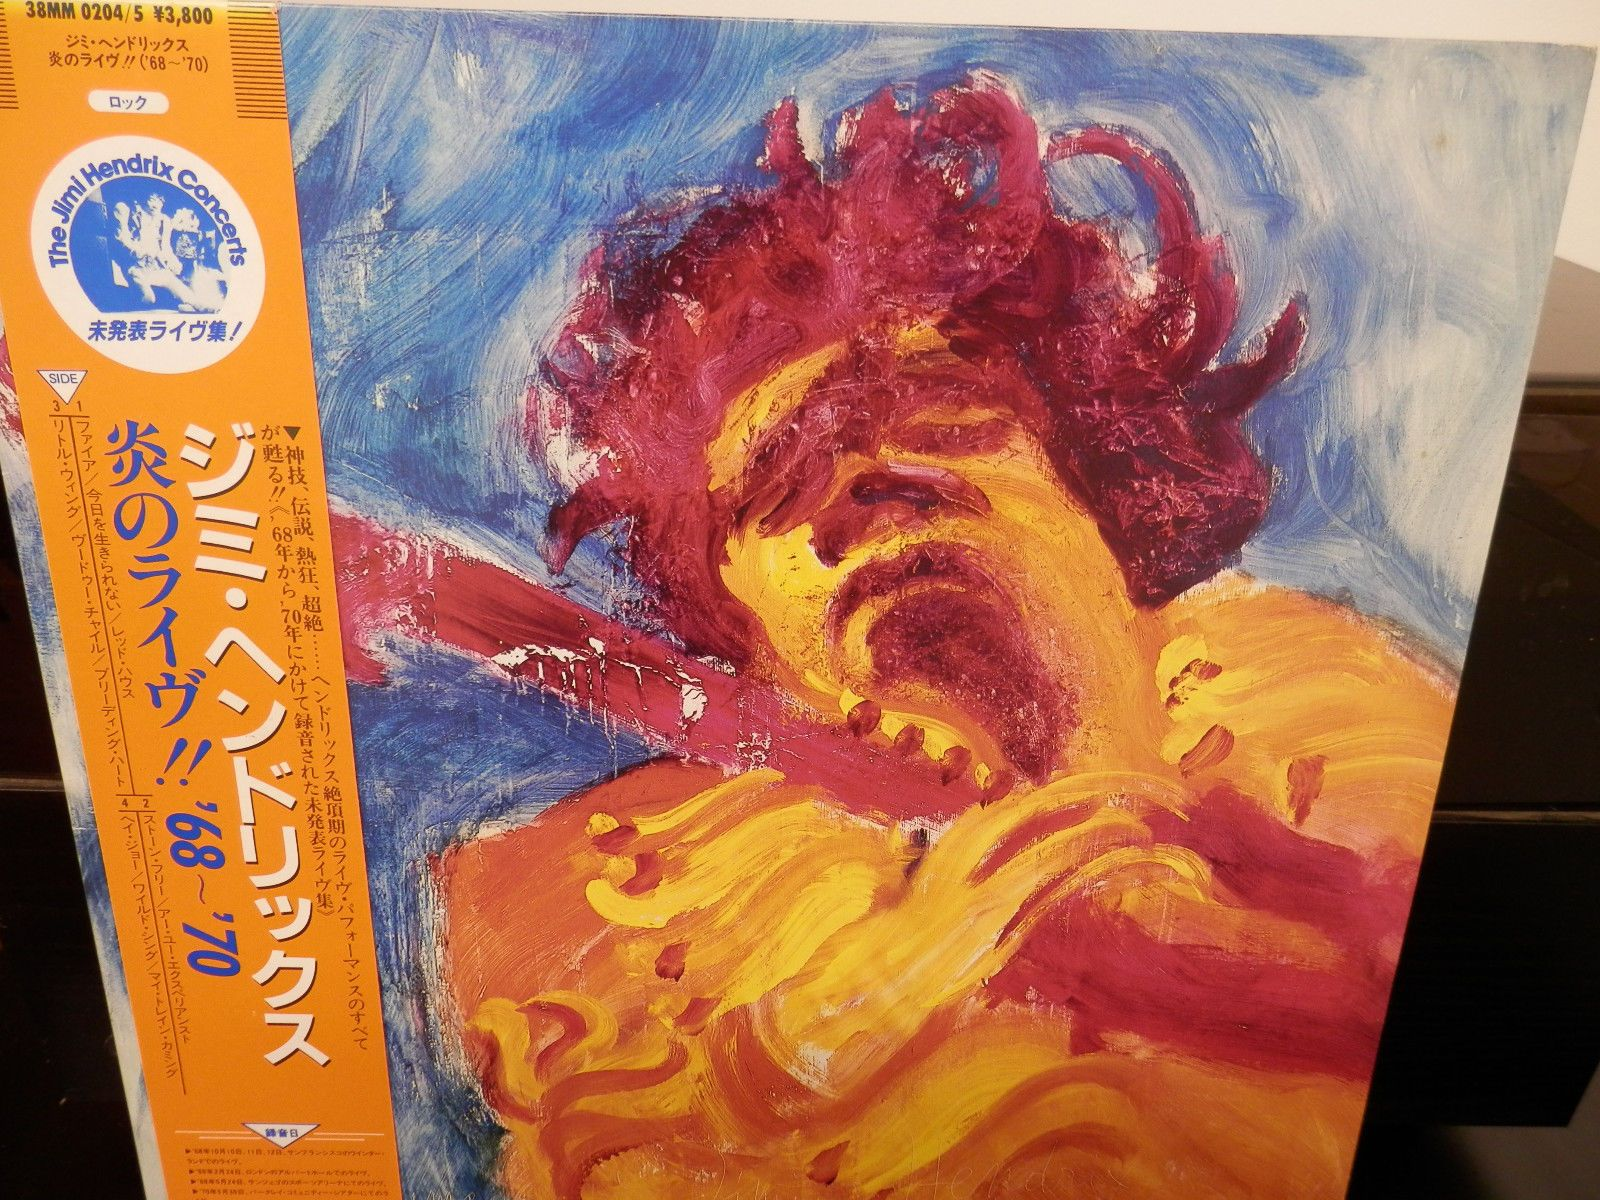 Jimi Hendrix-Concerts..Japan Import 2LP Set/Obi and Insert Audiophile. Near Mint